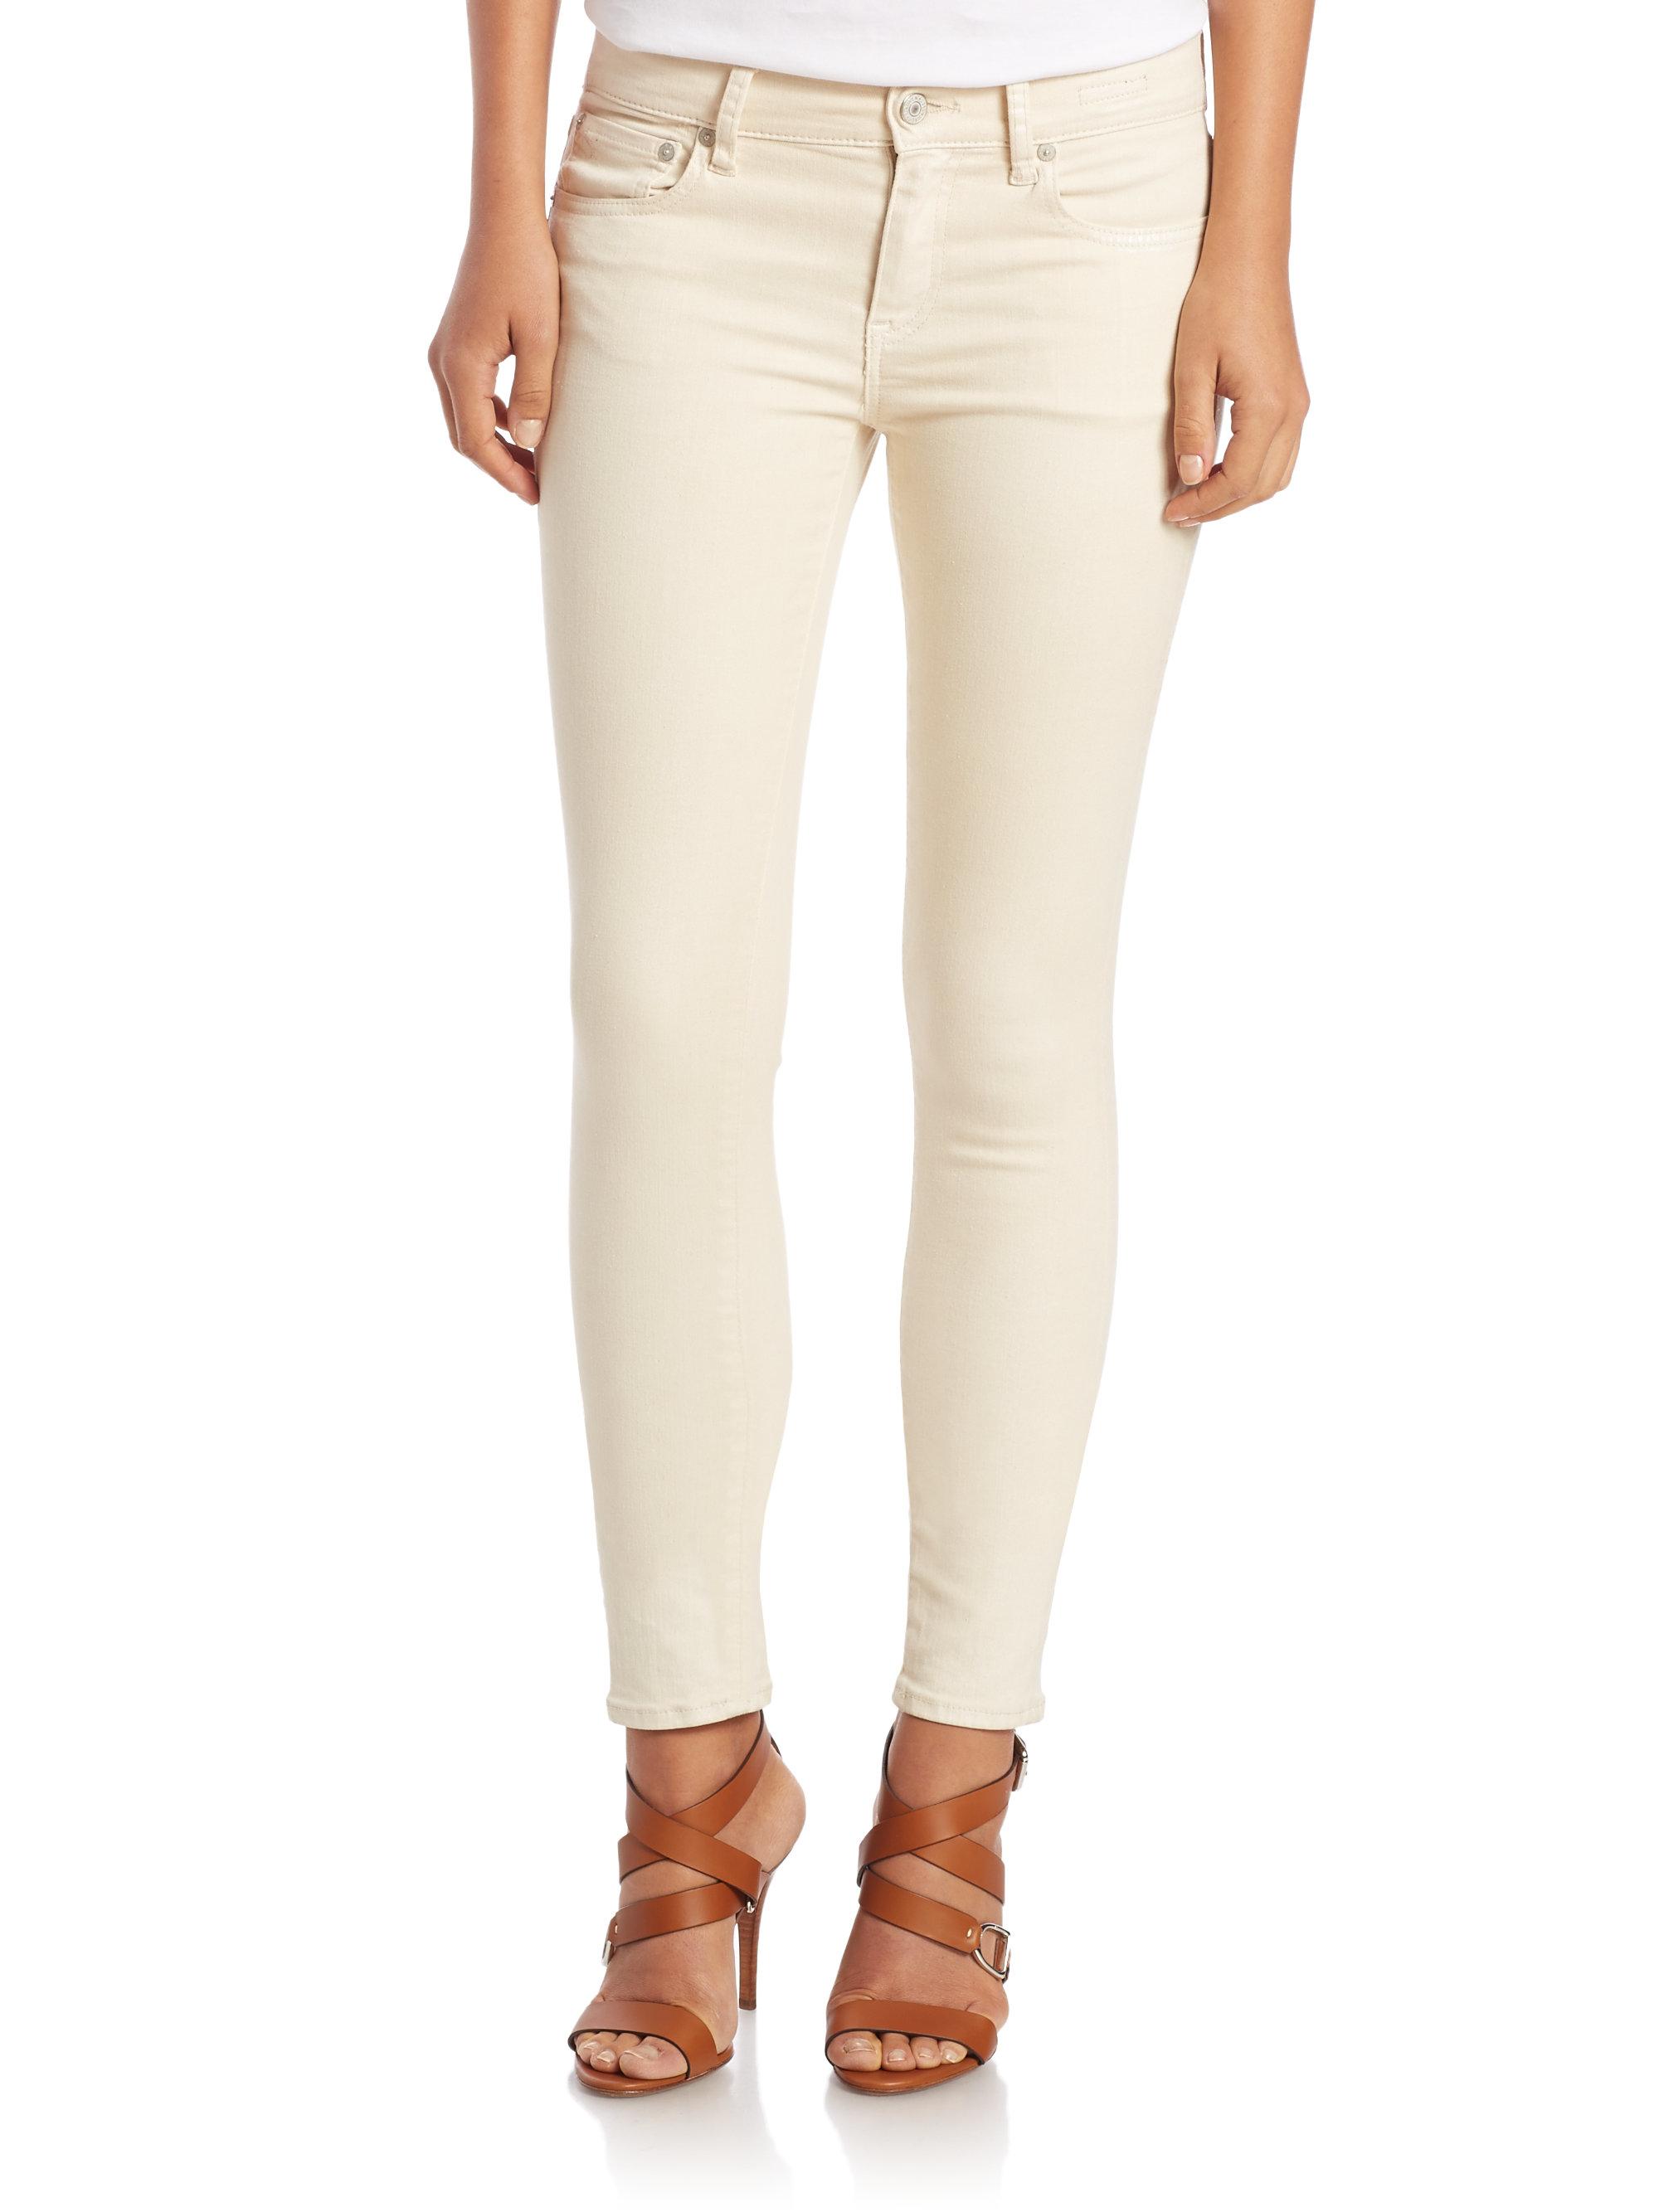 Cream denim skinny jeans